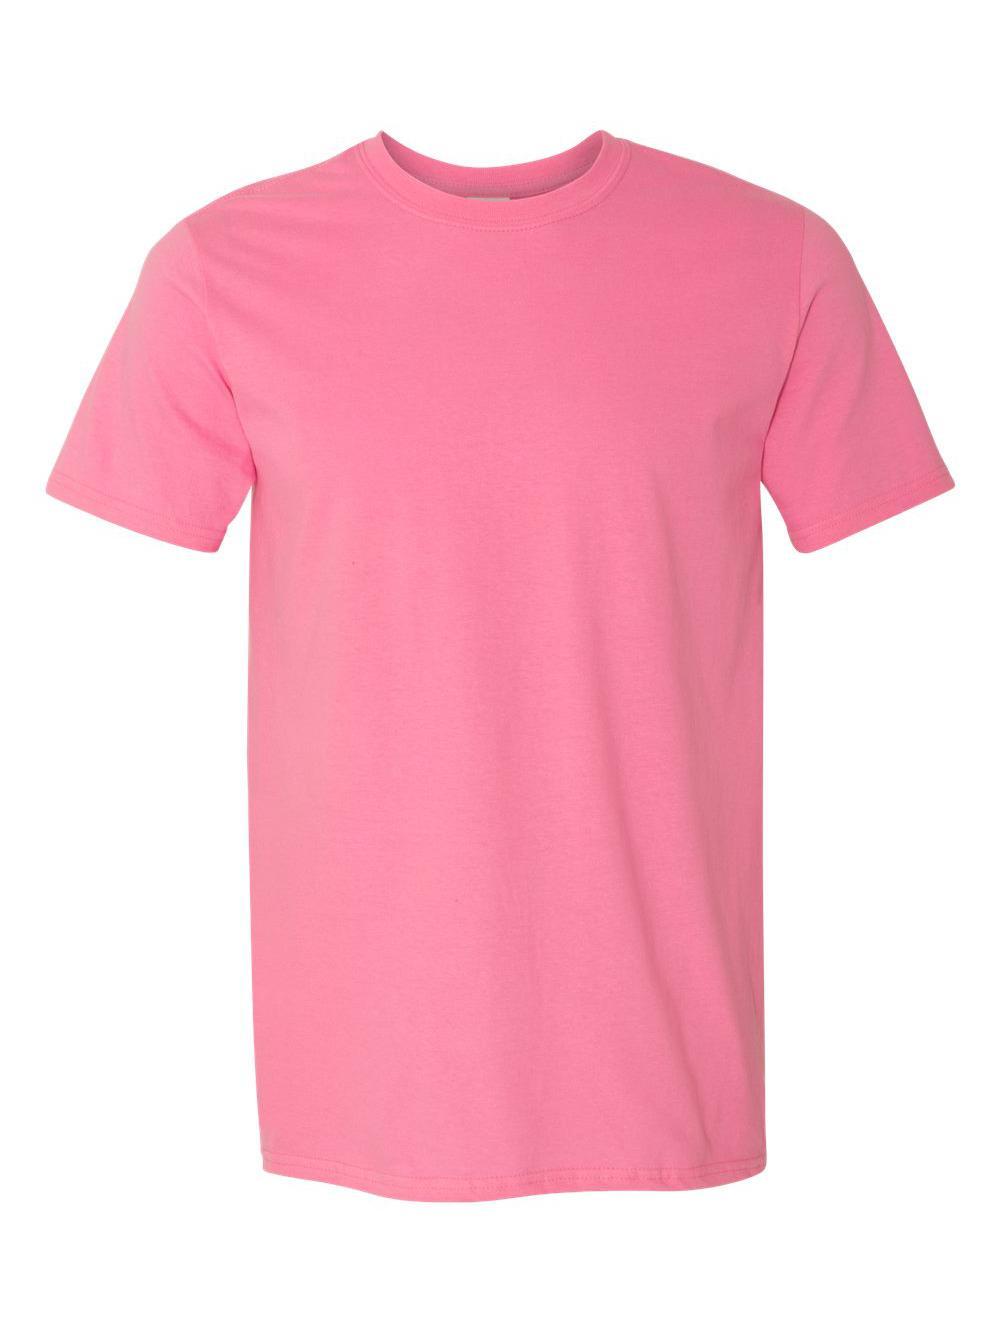 Gildan-Softstyle-T-Shirt-64000 thumbnail 12